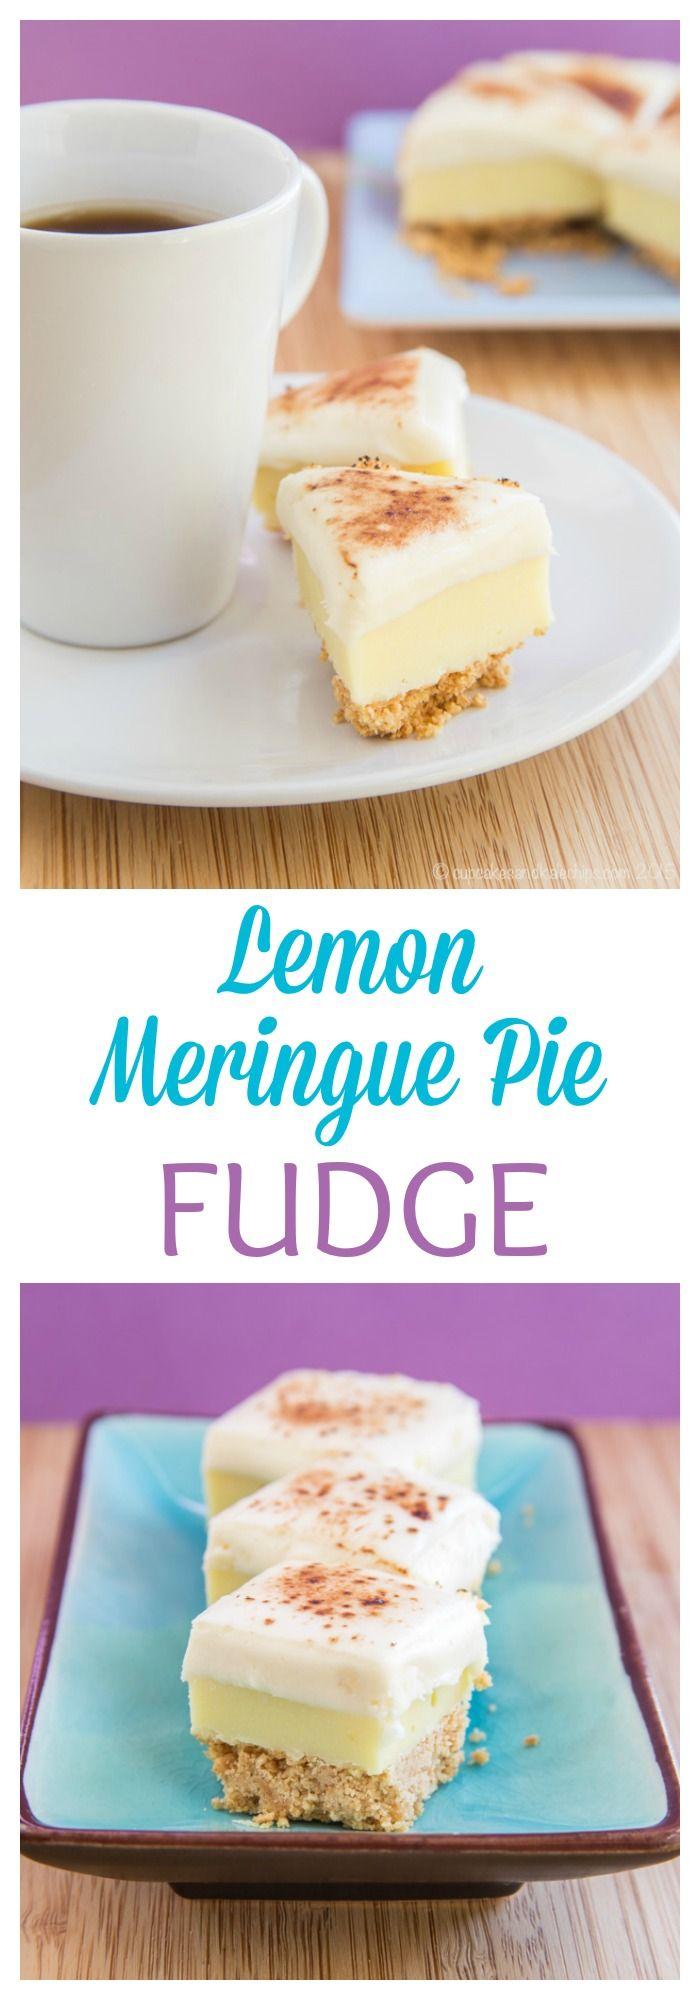 Photo of Lemon Meringue Pie Fudge – Cupcakes & Kale Chips